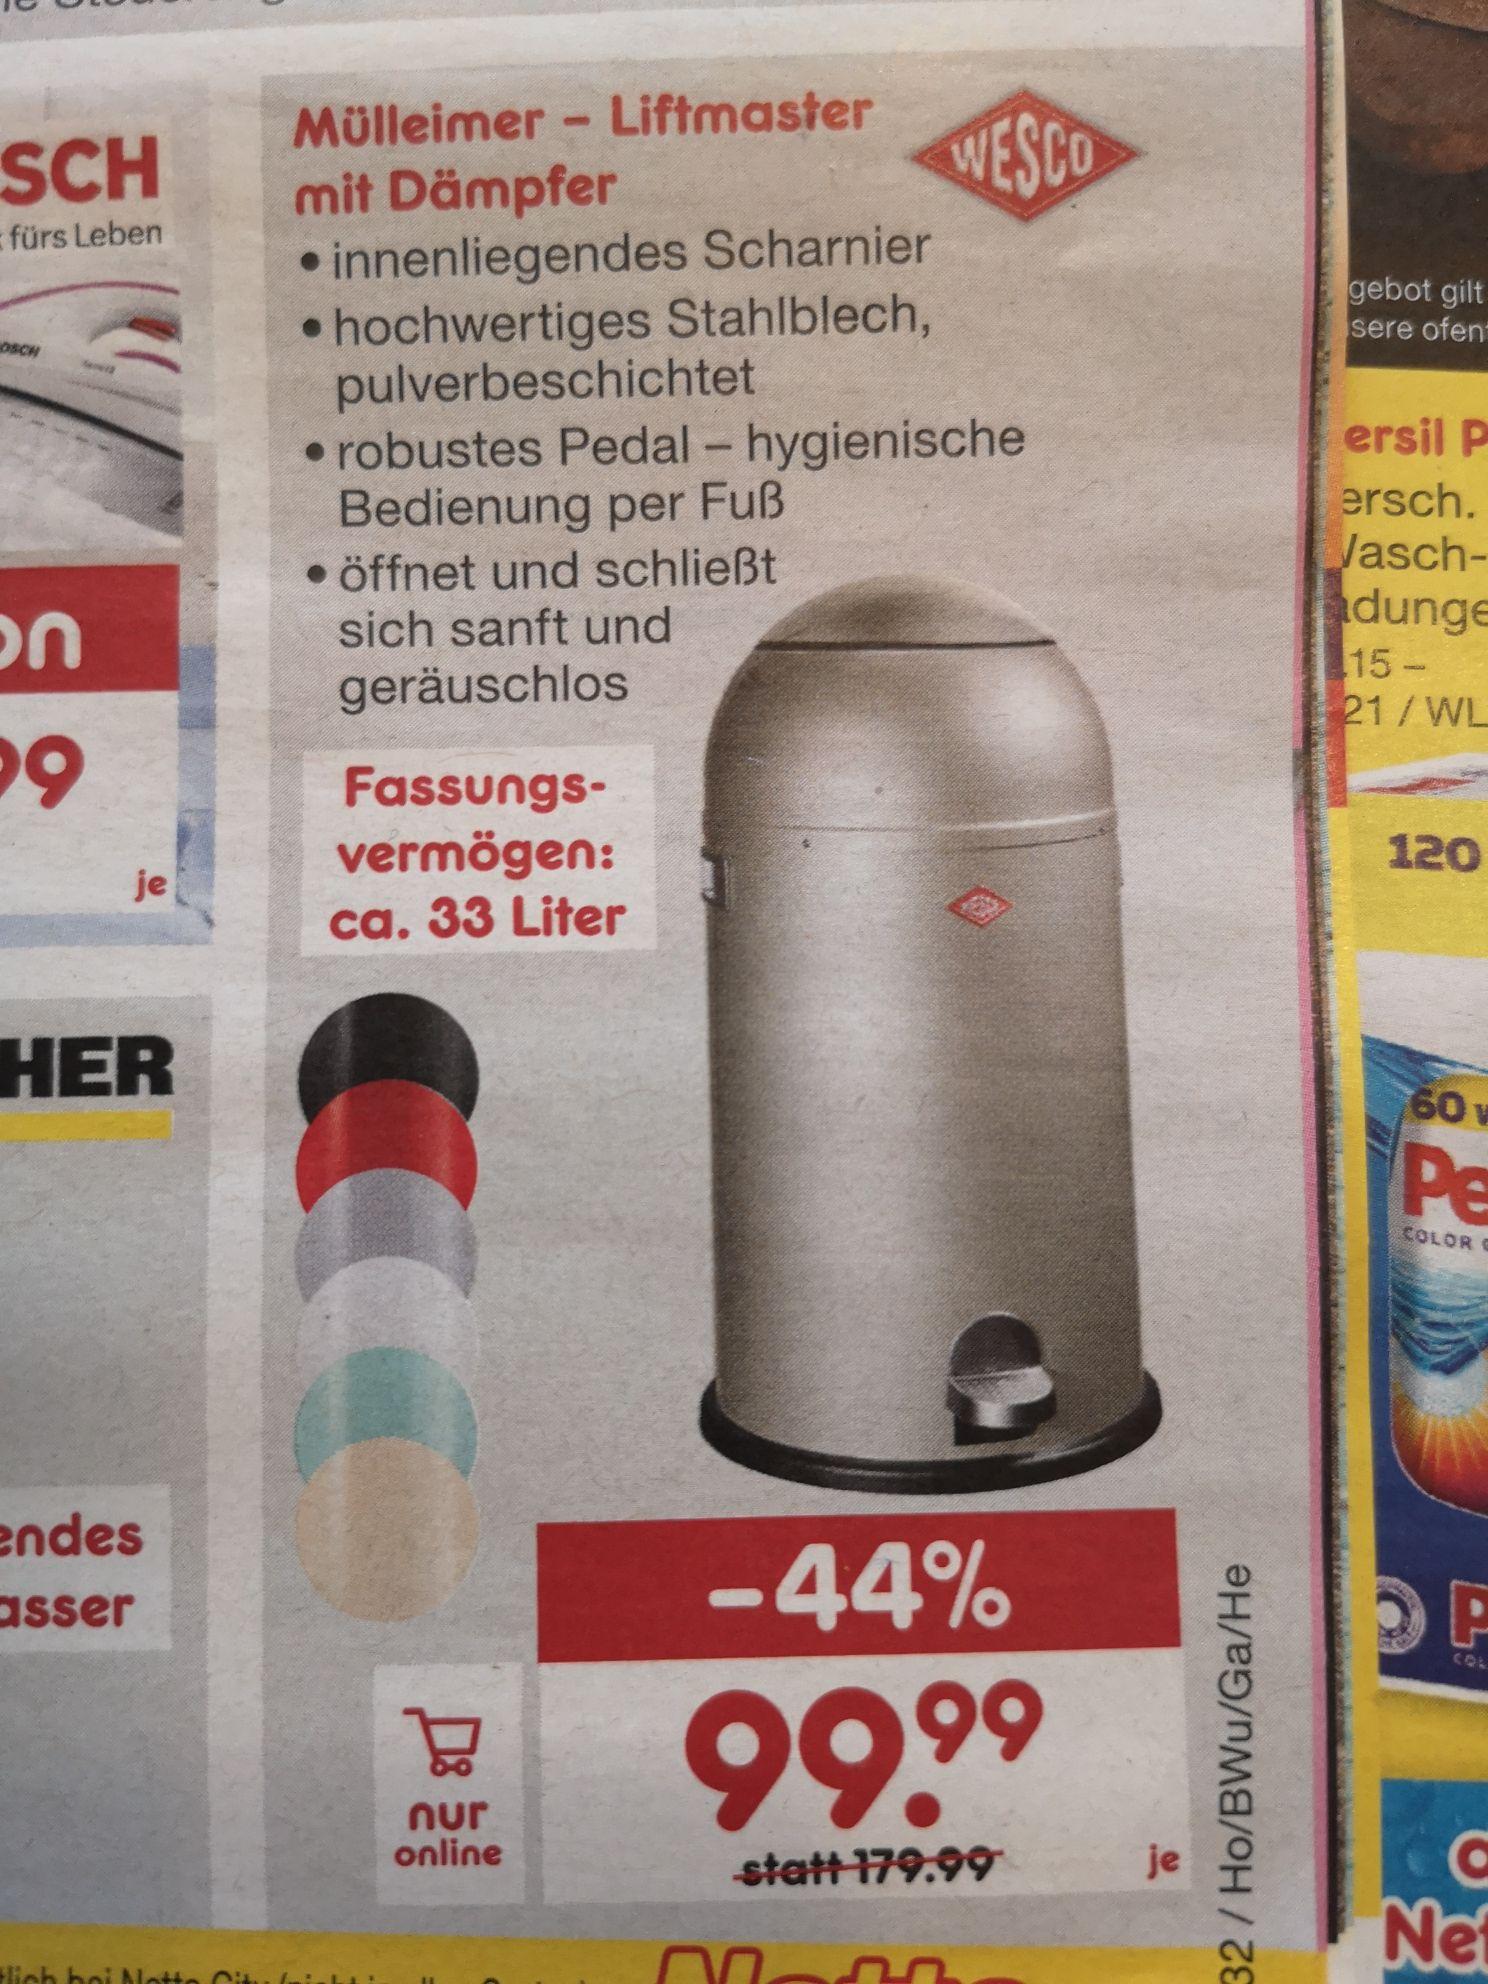 Wesco Liftmaster Mülleimer 33 Liter